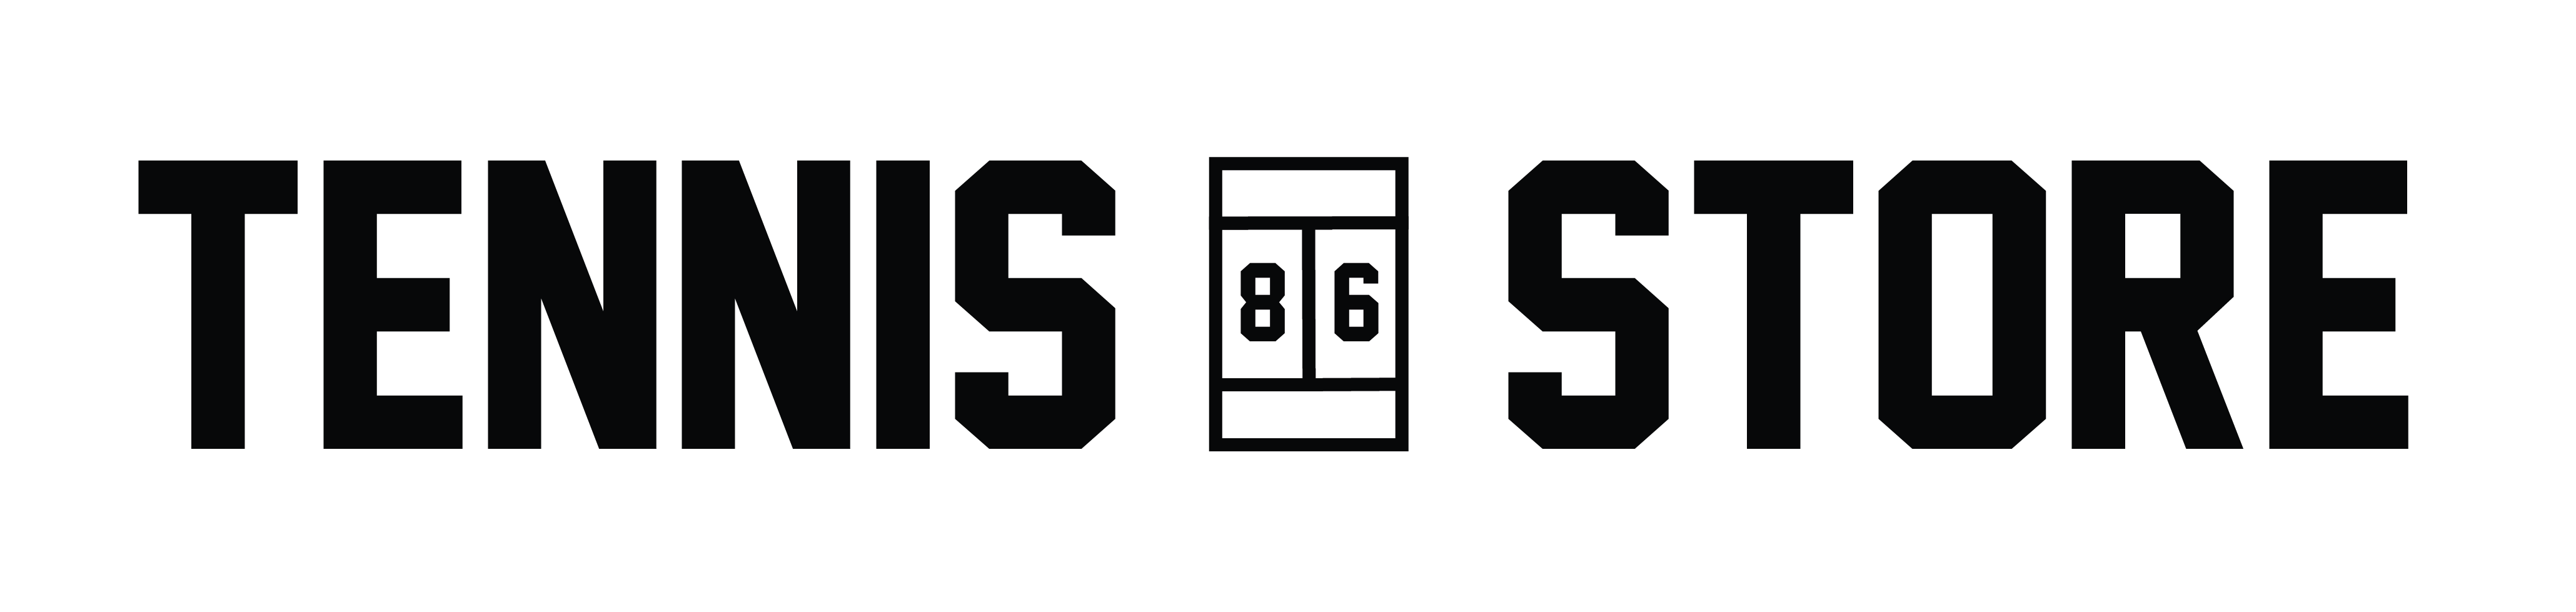 Tennisstore 86